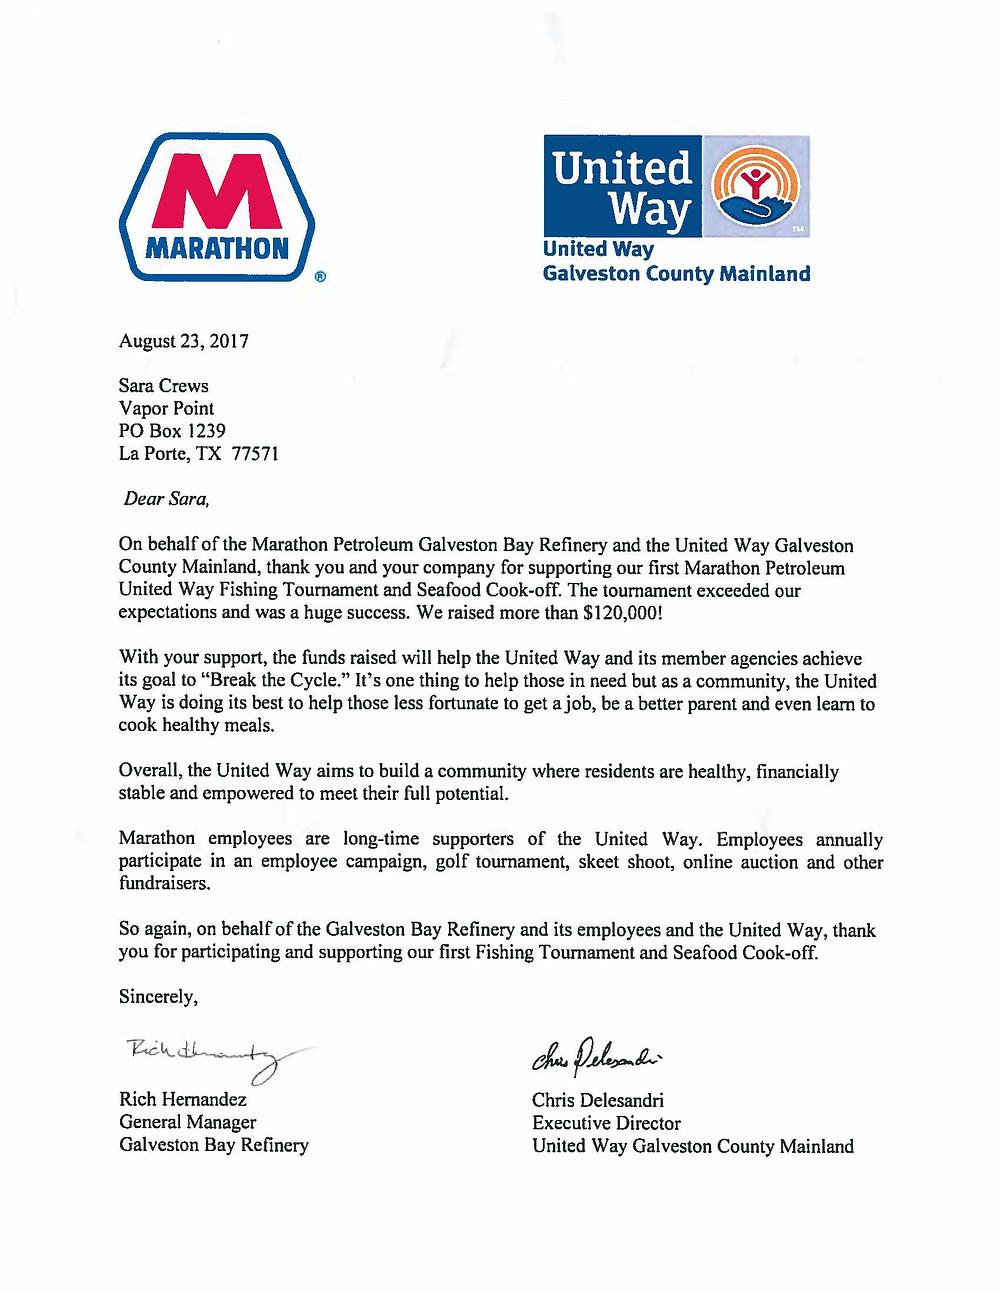 Thank-you letter from Marathon Petroleum to Vapor Point